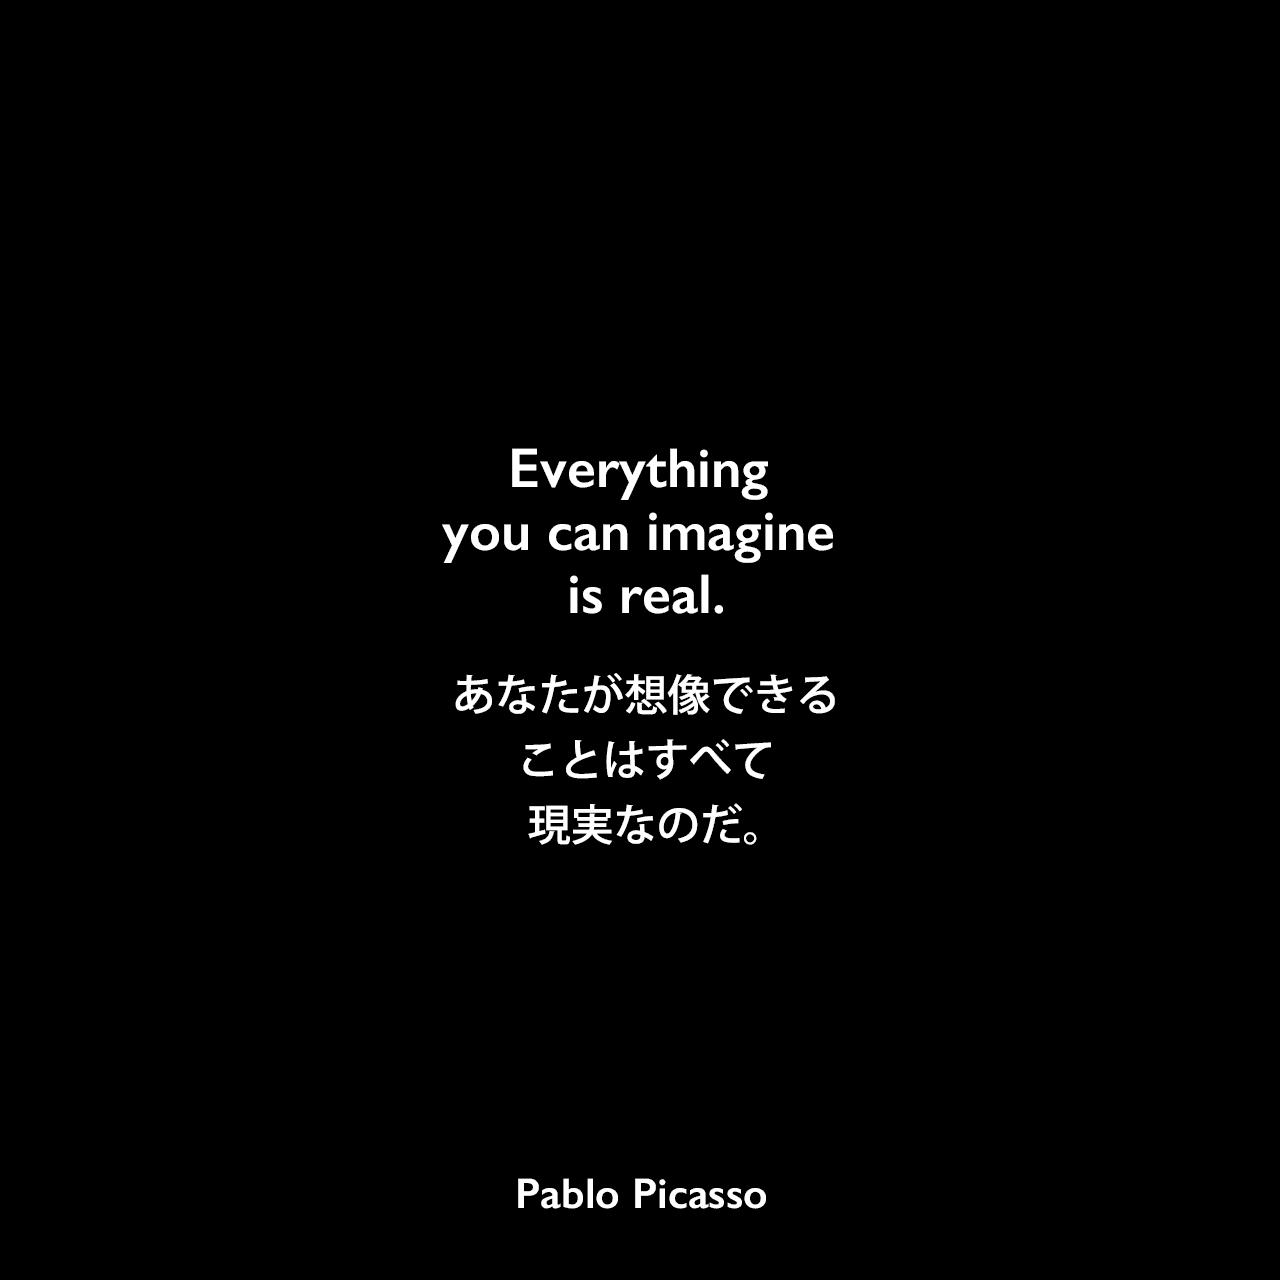 Everything you can imagine is real.あなたが想像できることは、すべて現実なのだ。